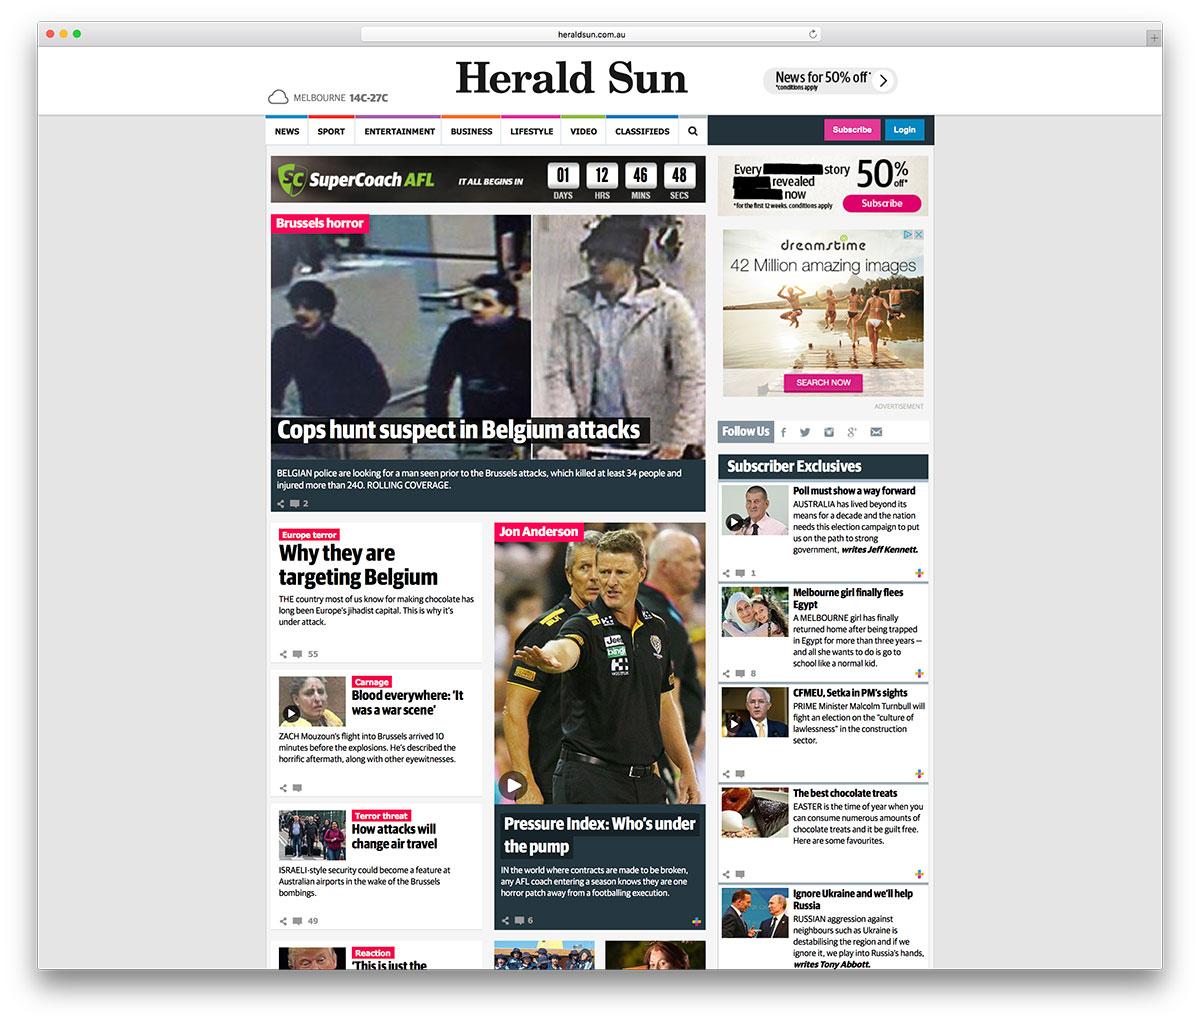 heraldsun-classic-magazine-site-example